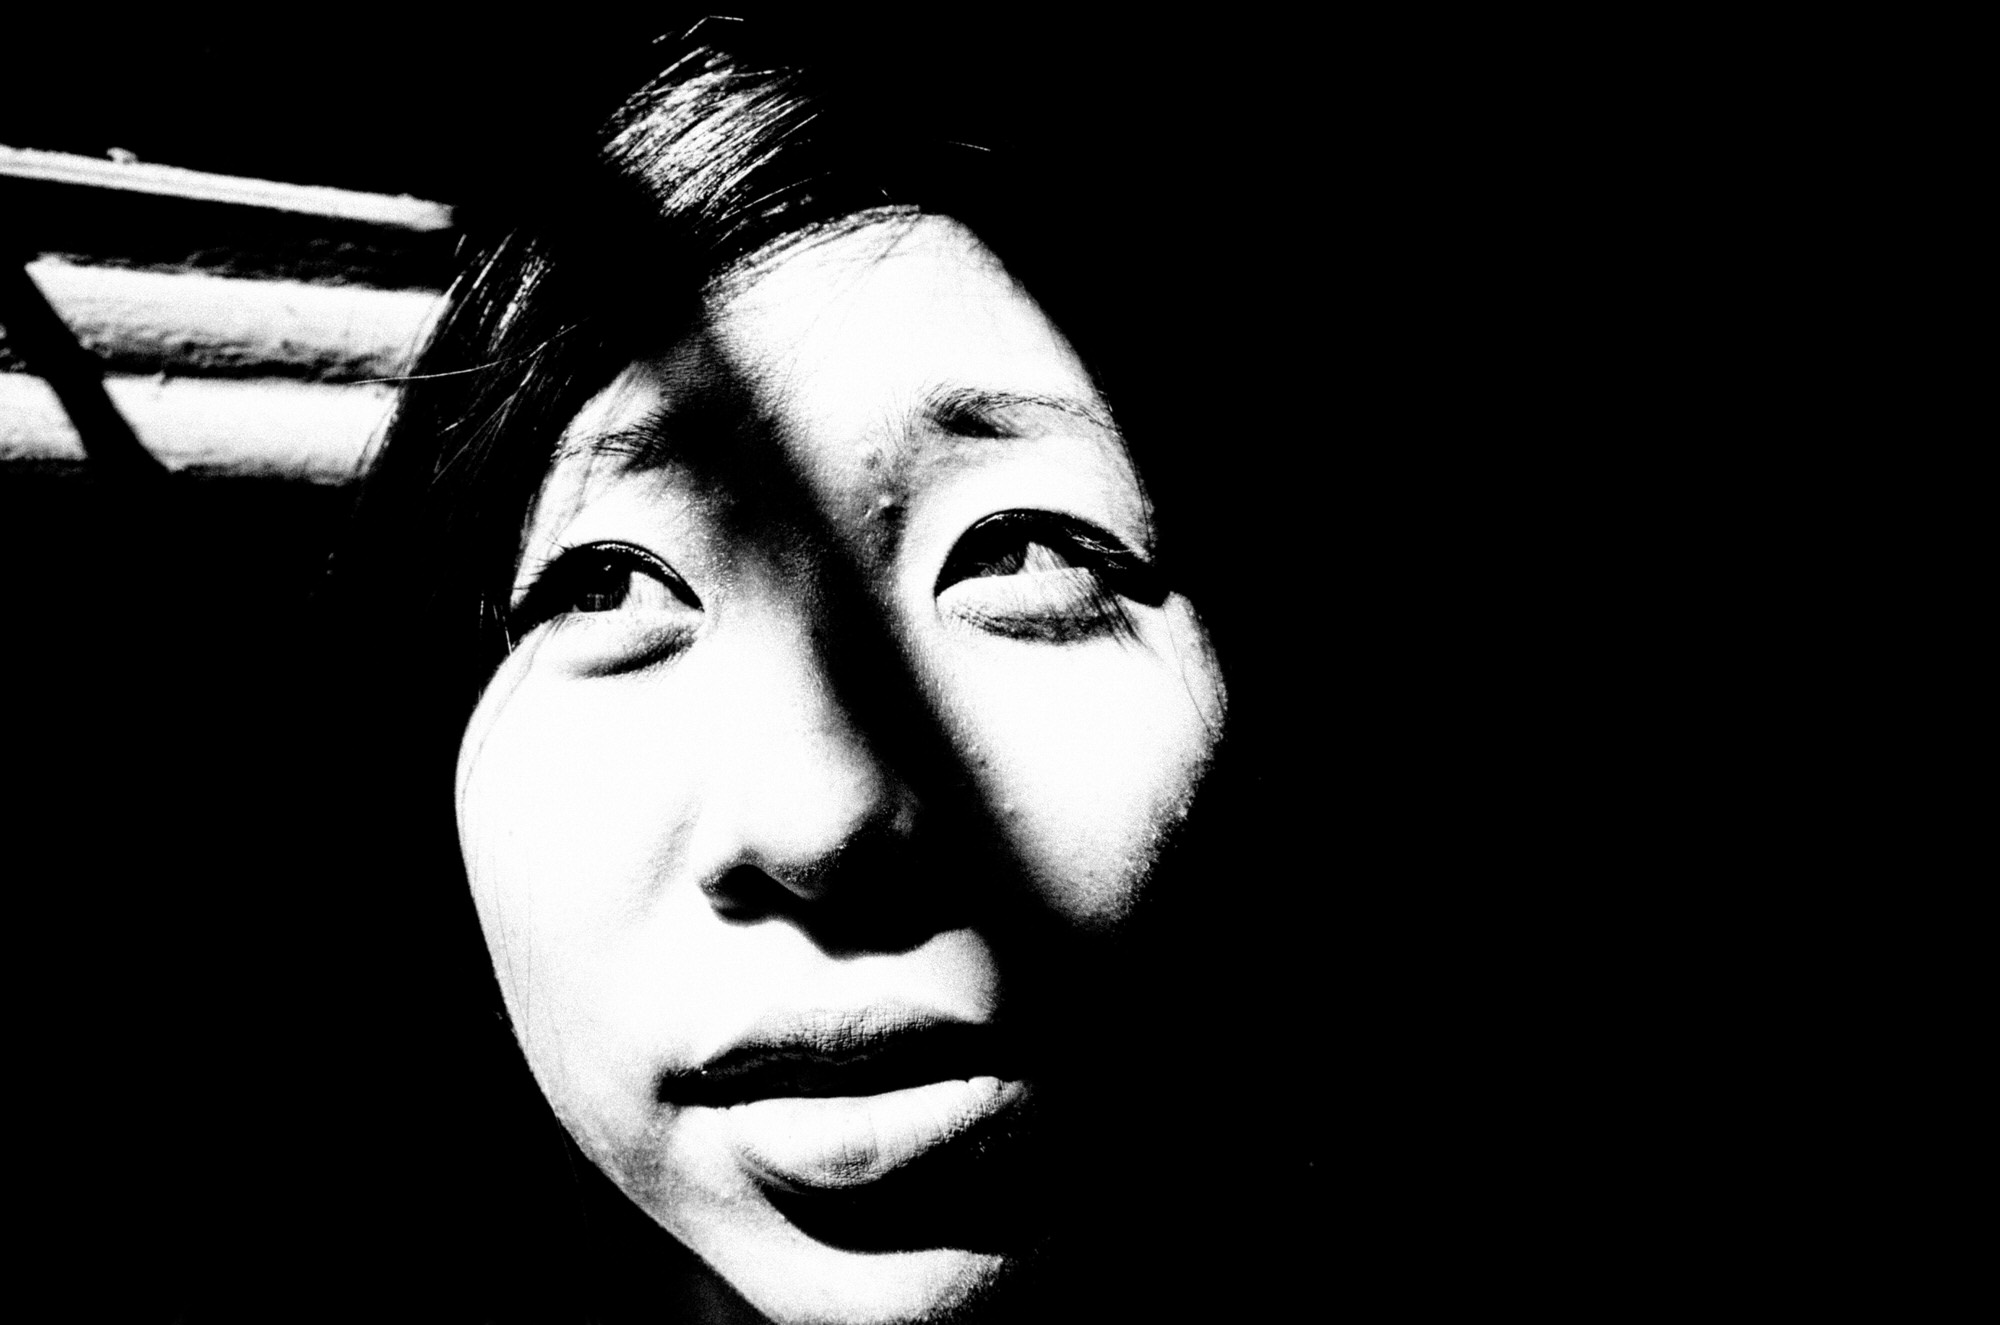 eric kim photography hanoi-0007800